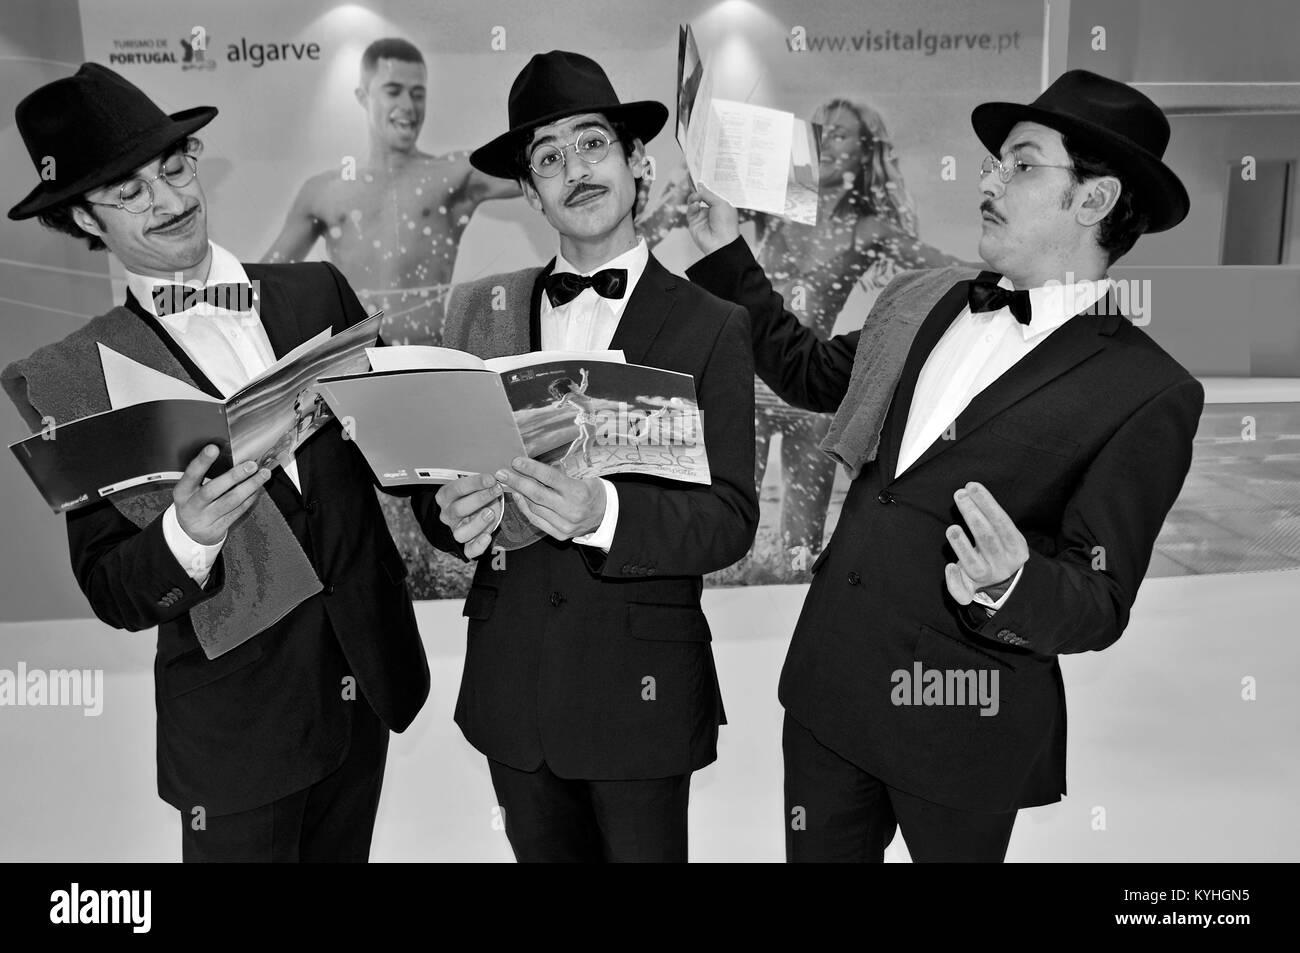 Three actors representing heteronyms of portuguese national poet Fernando Pessoa - Stock Image